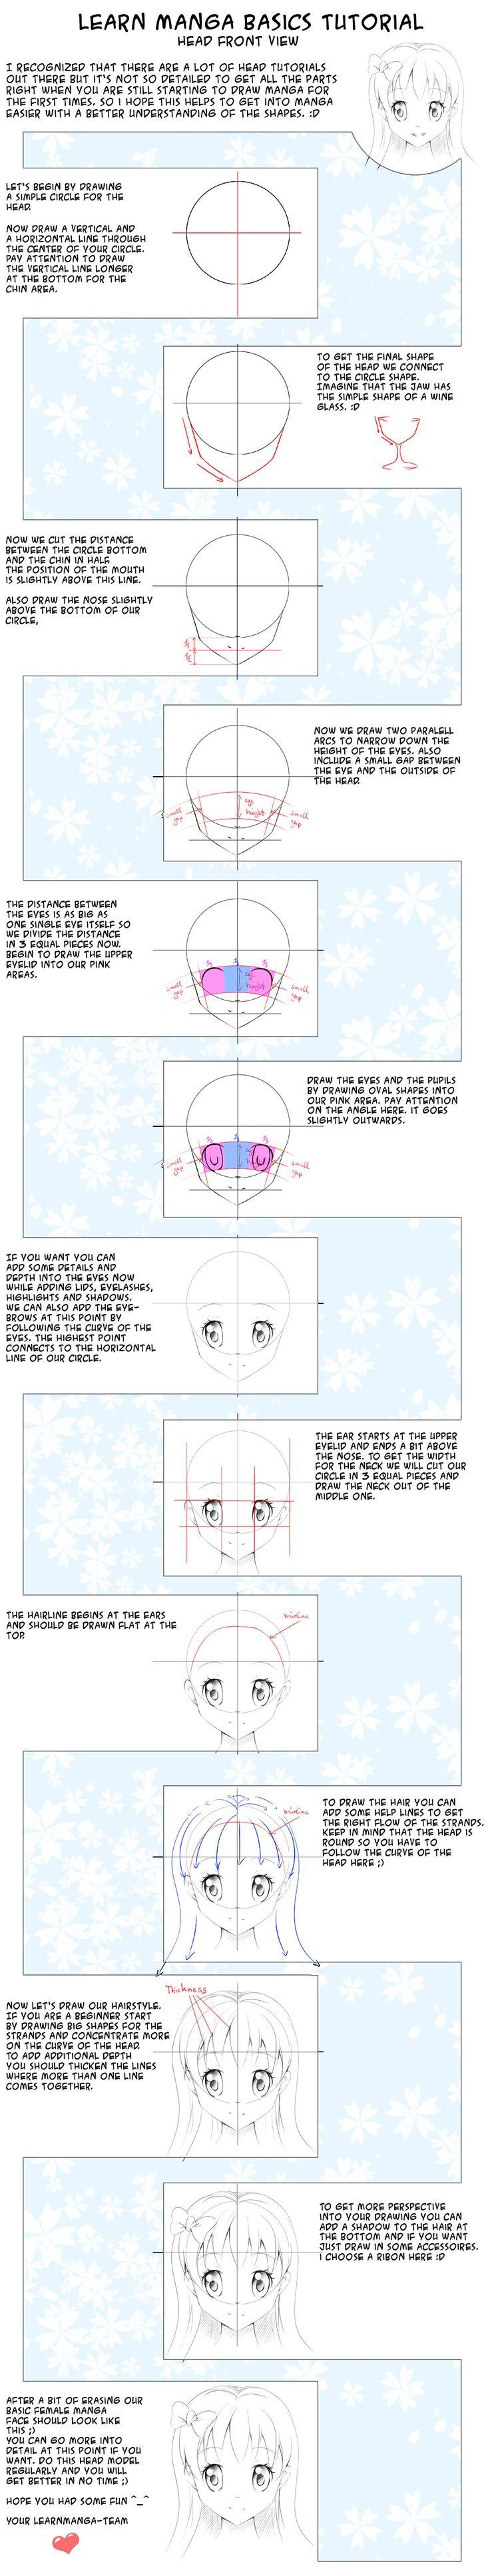 Learn Manga Basics Head Front View Tutorial by *Oceans-Art on deviantART